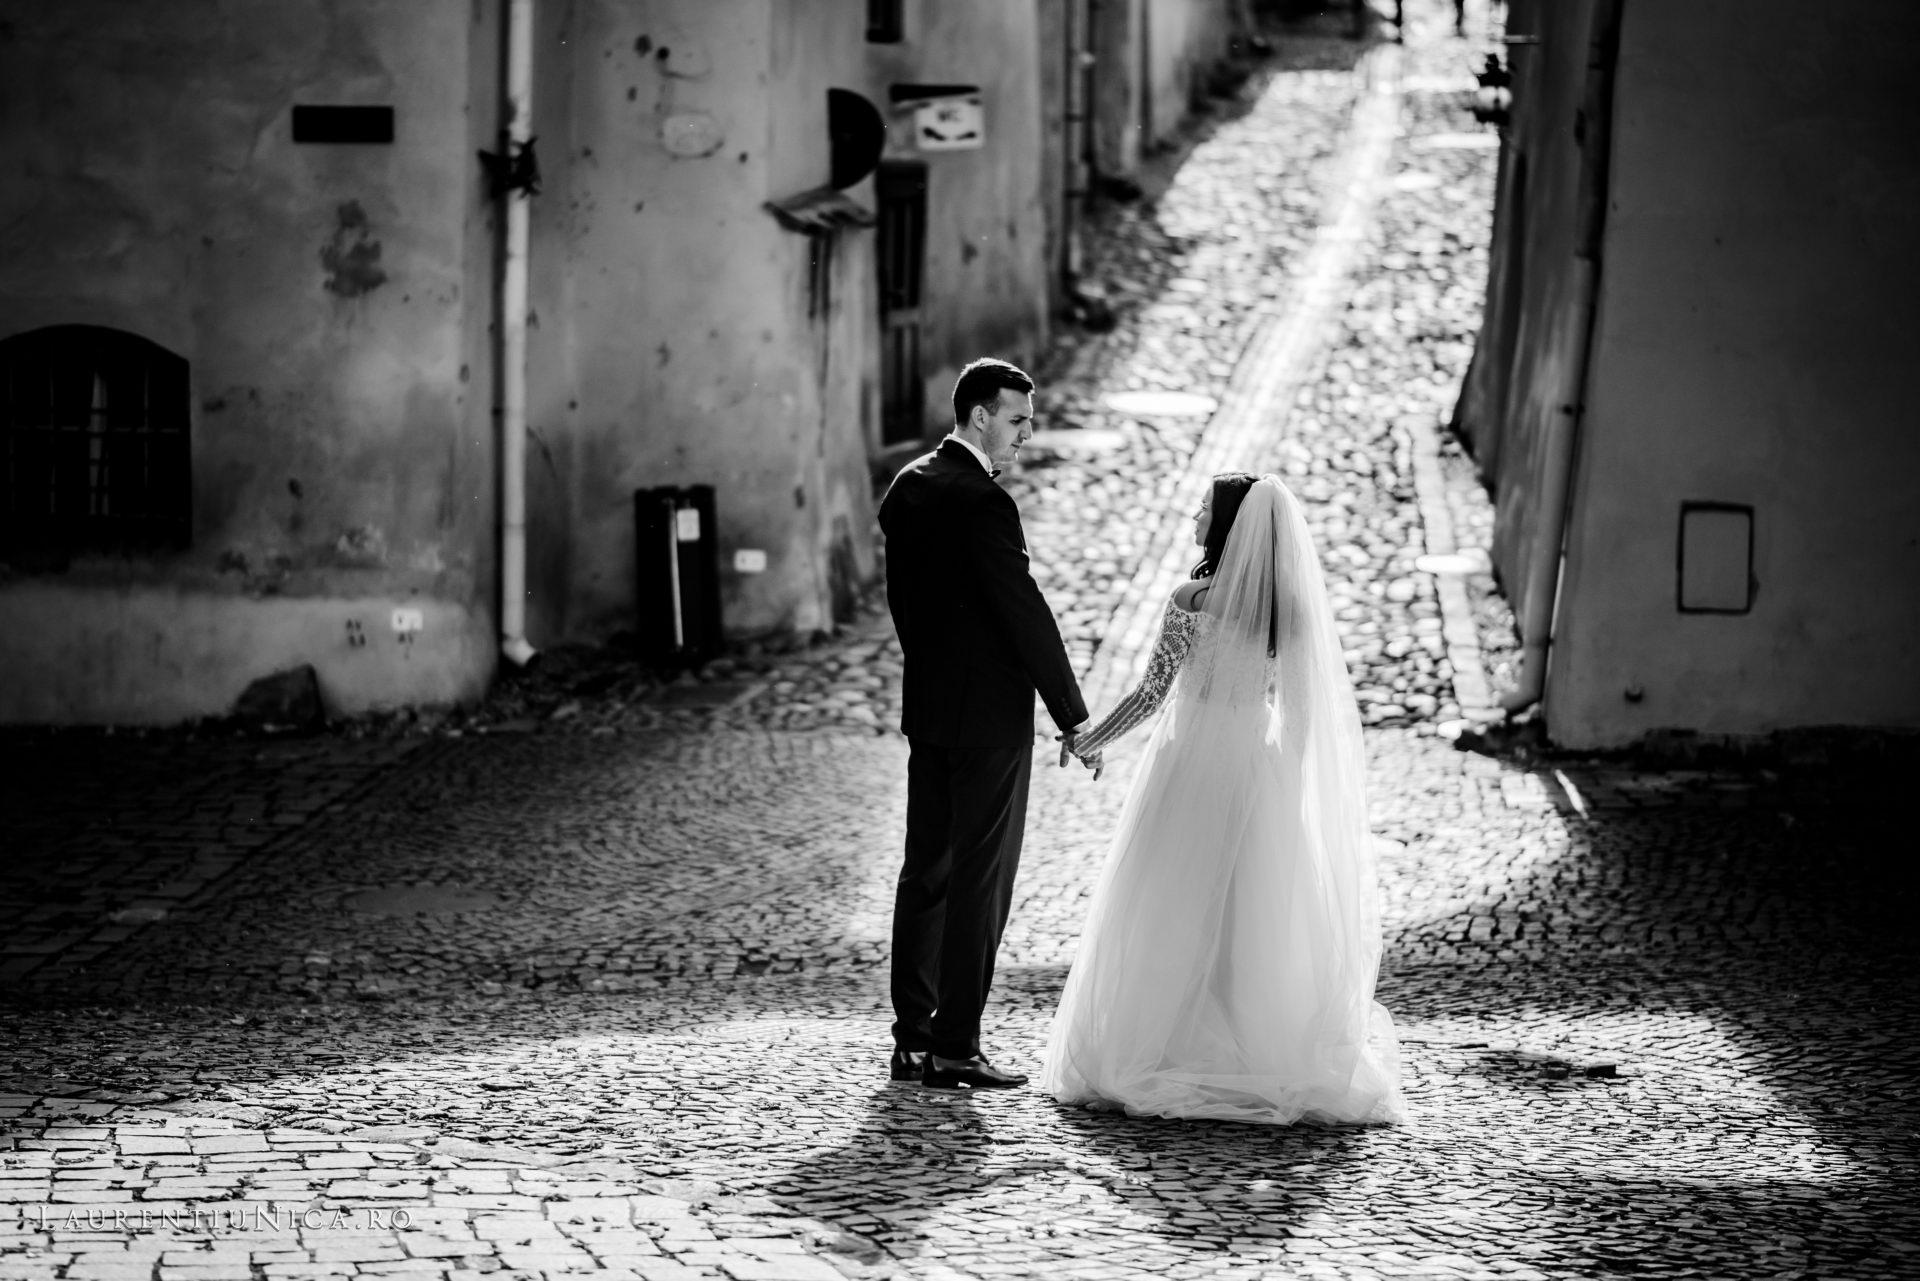 lili-si-dan-fotografii-nunta-after-wedding-sighisoara-laurentiu-nica11